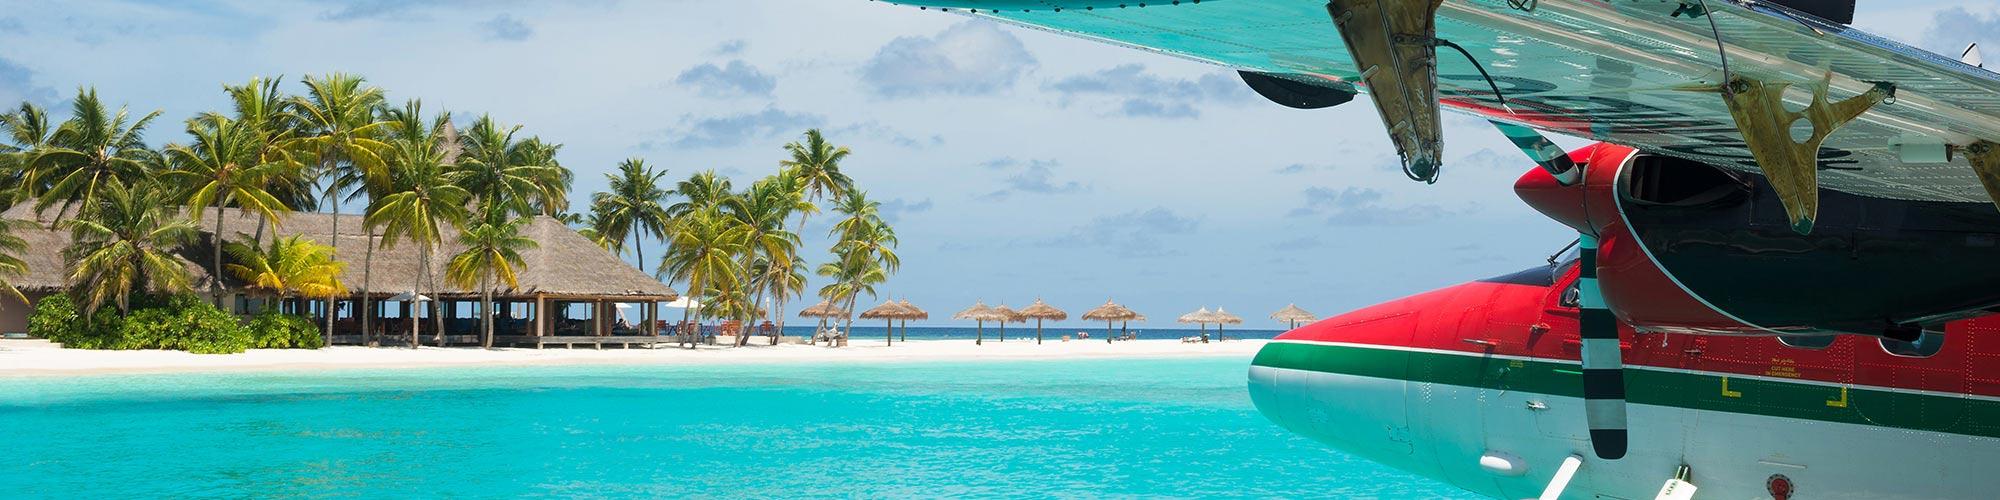 maldives-banner-3.jpg